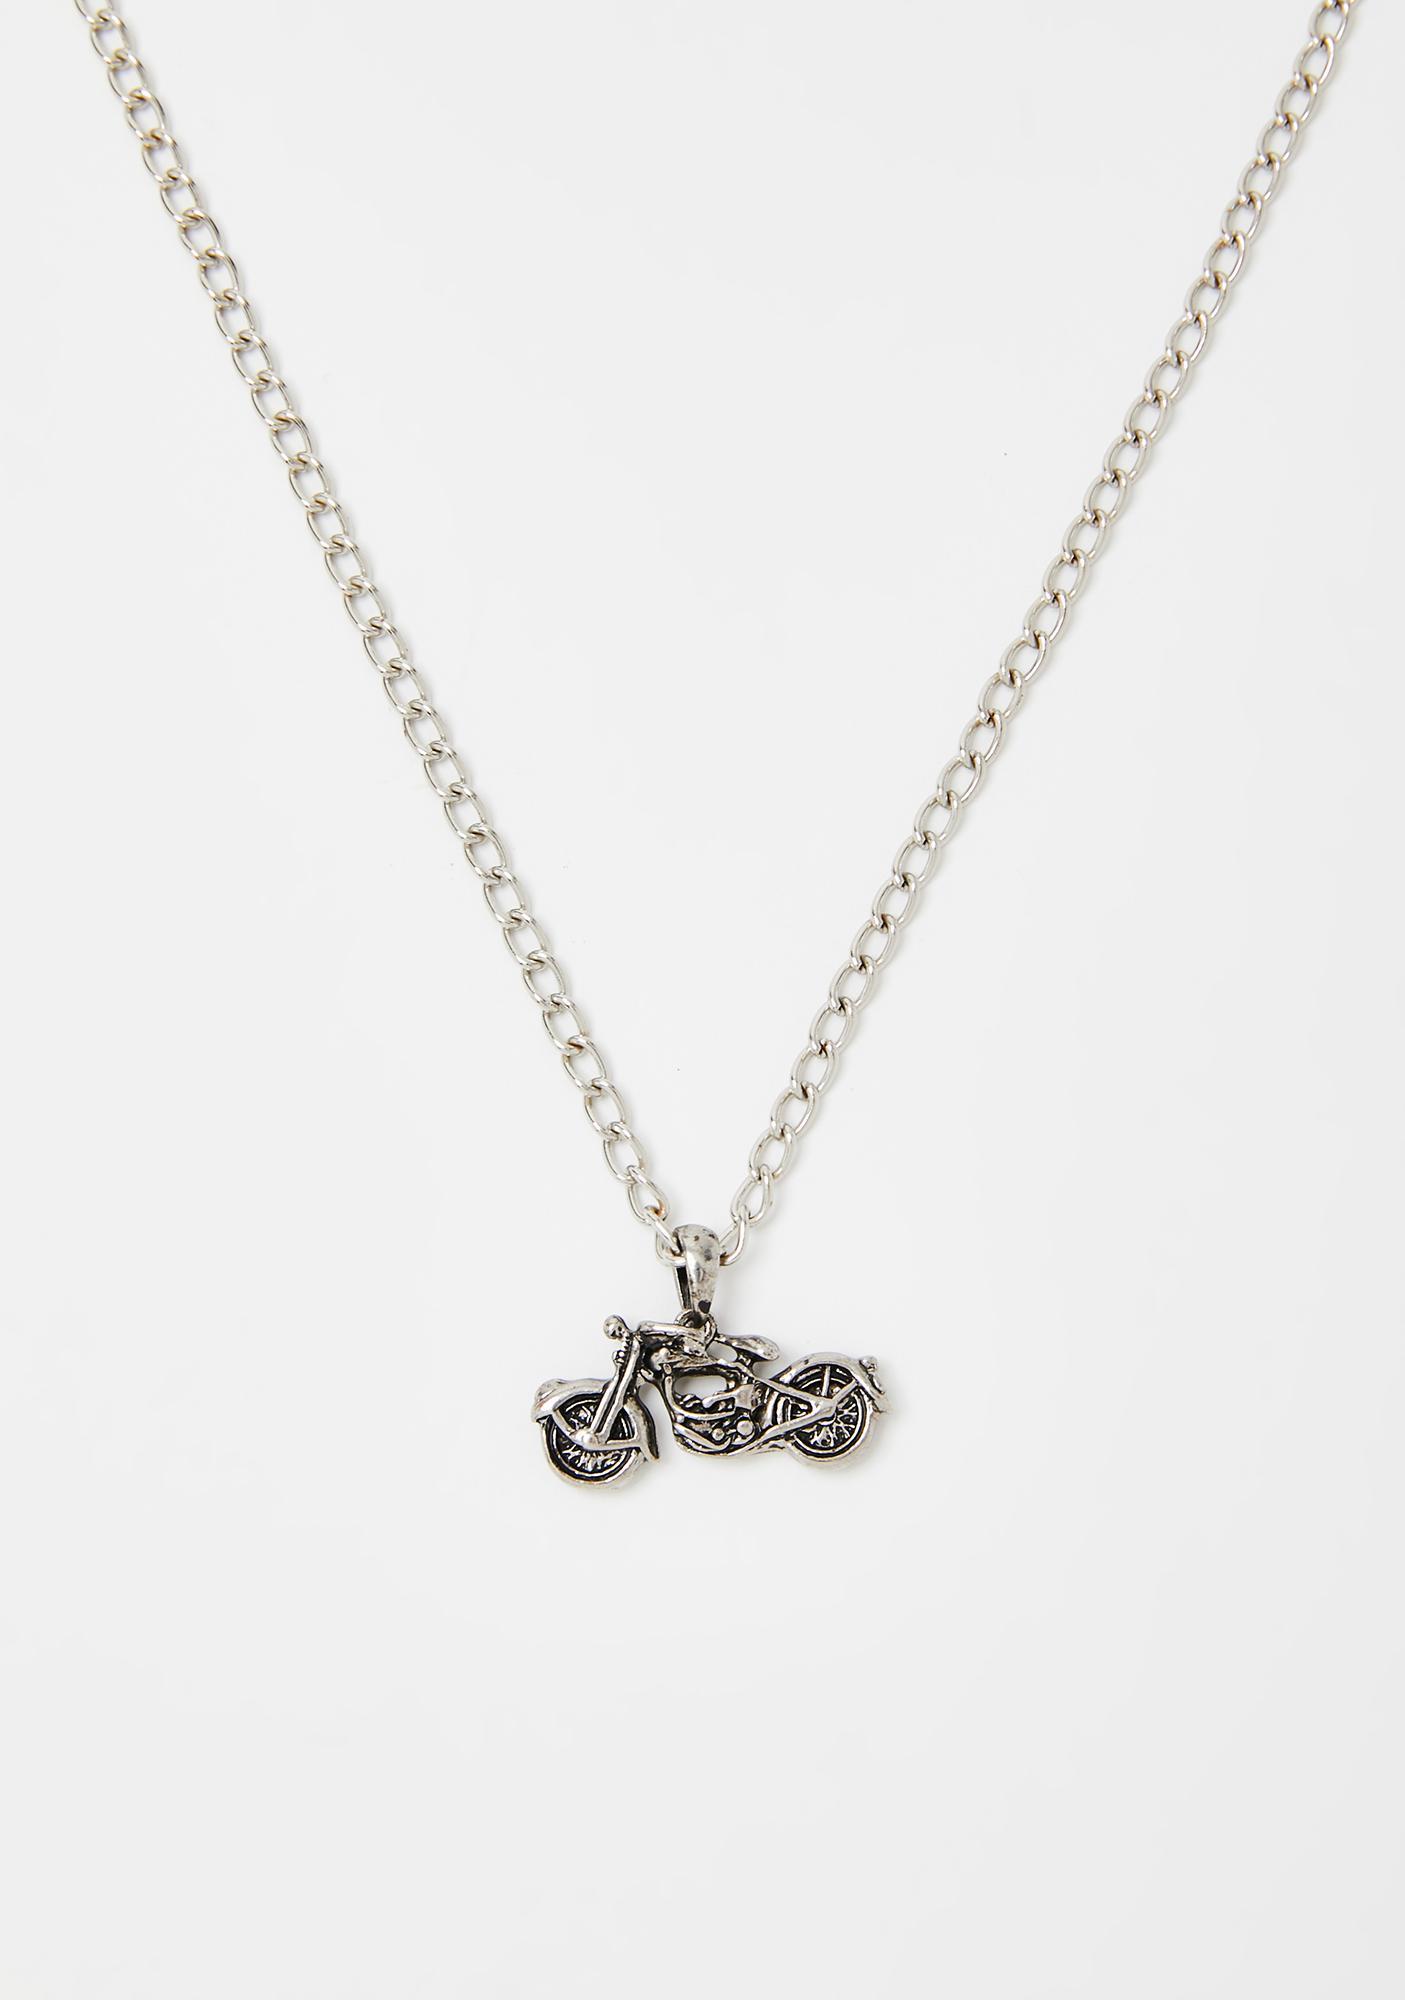 Chrashin' Youngin' Moto Necklace